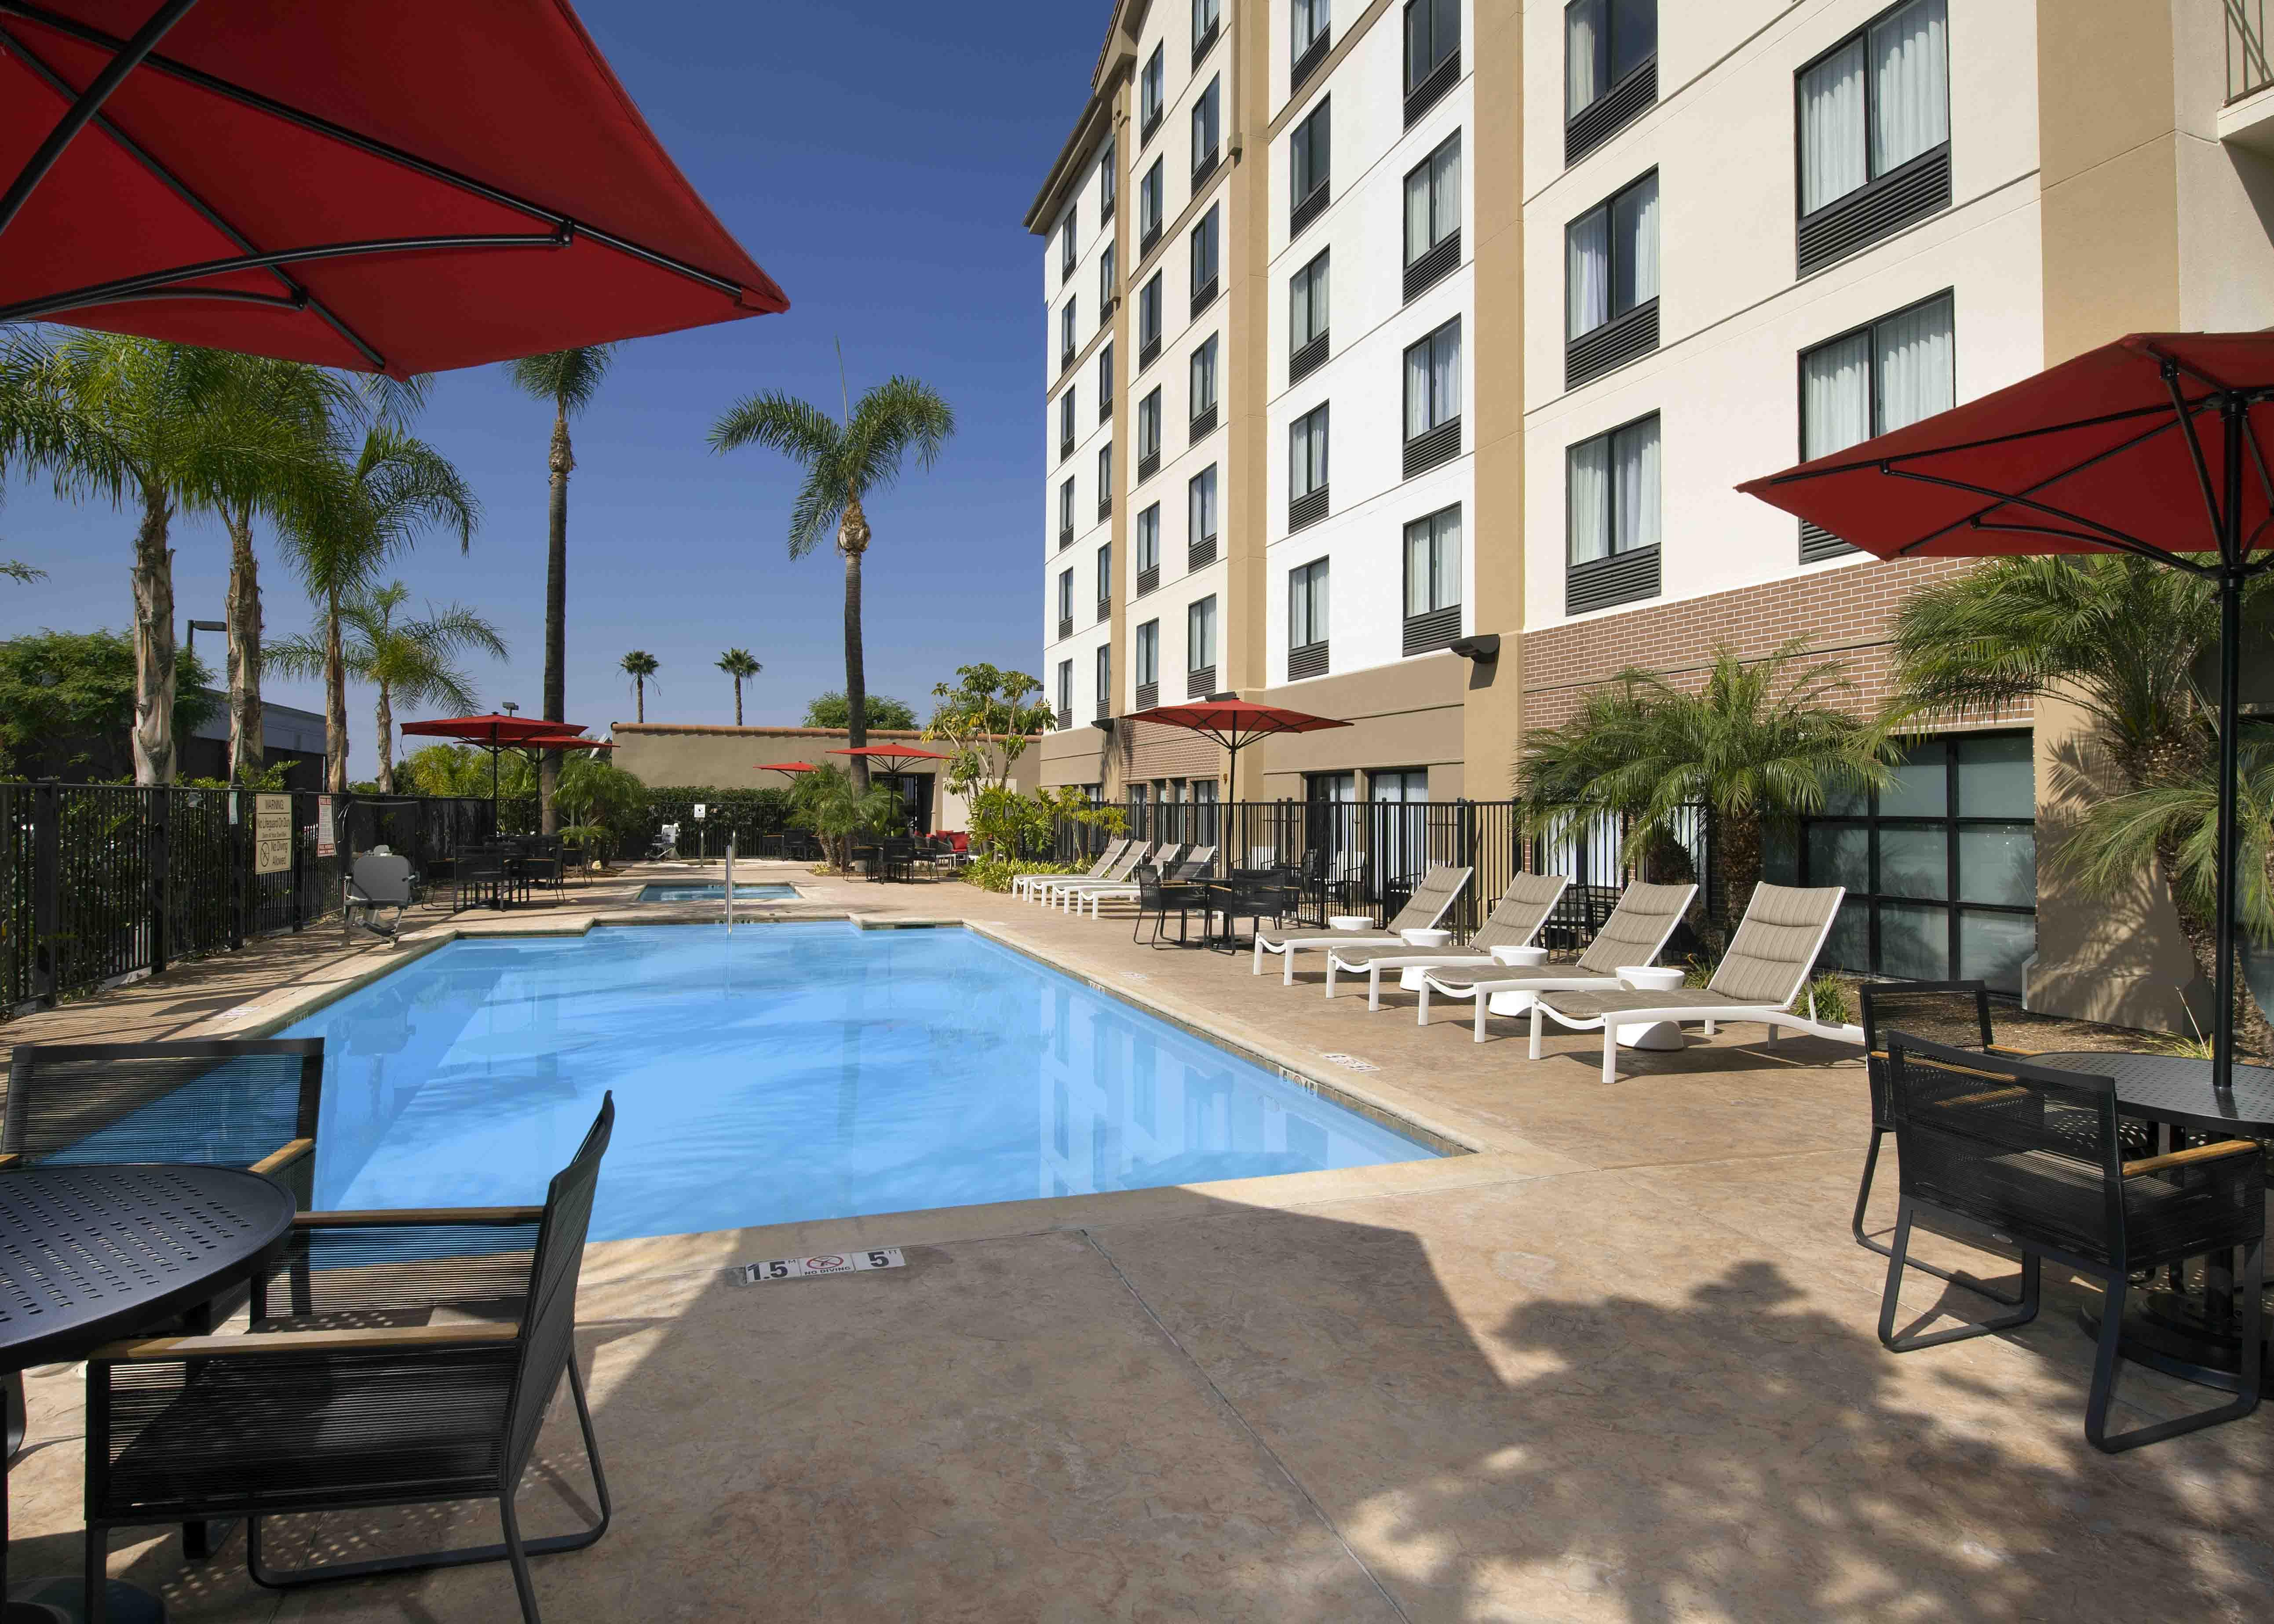 Hampton Inn Suites By Hilton Anaheim Garden Grove